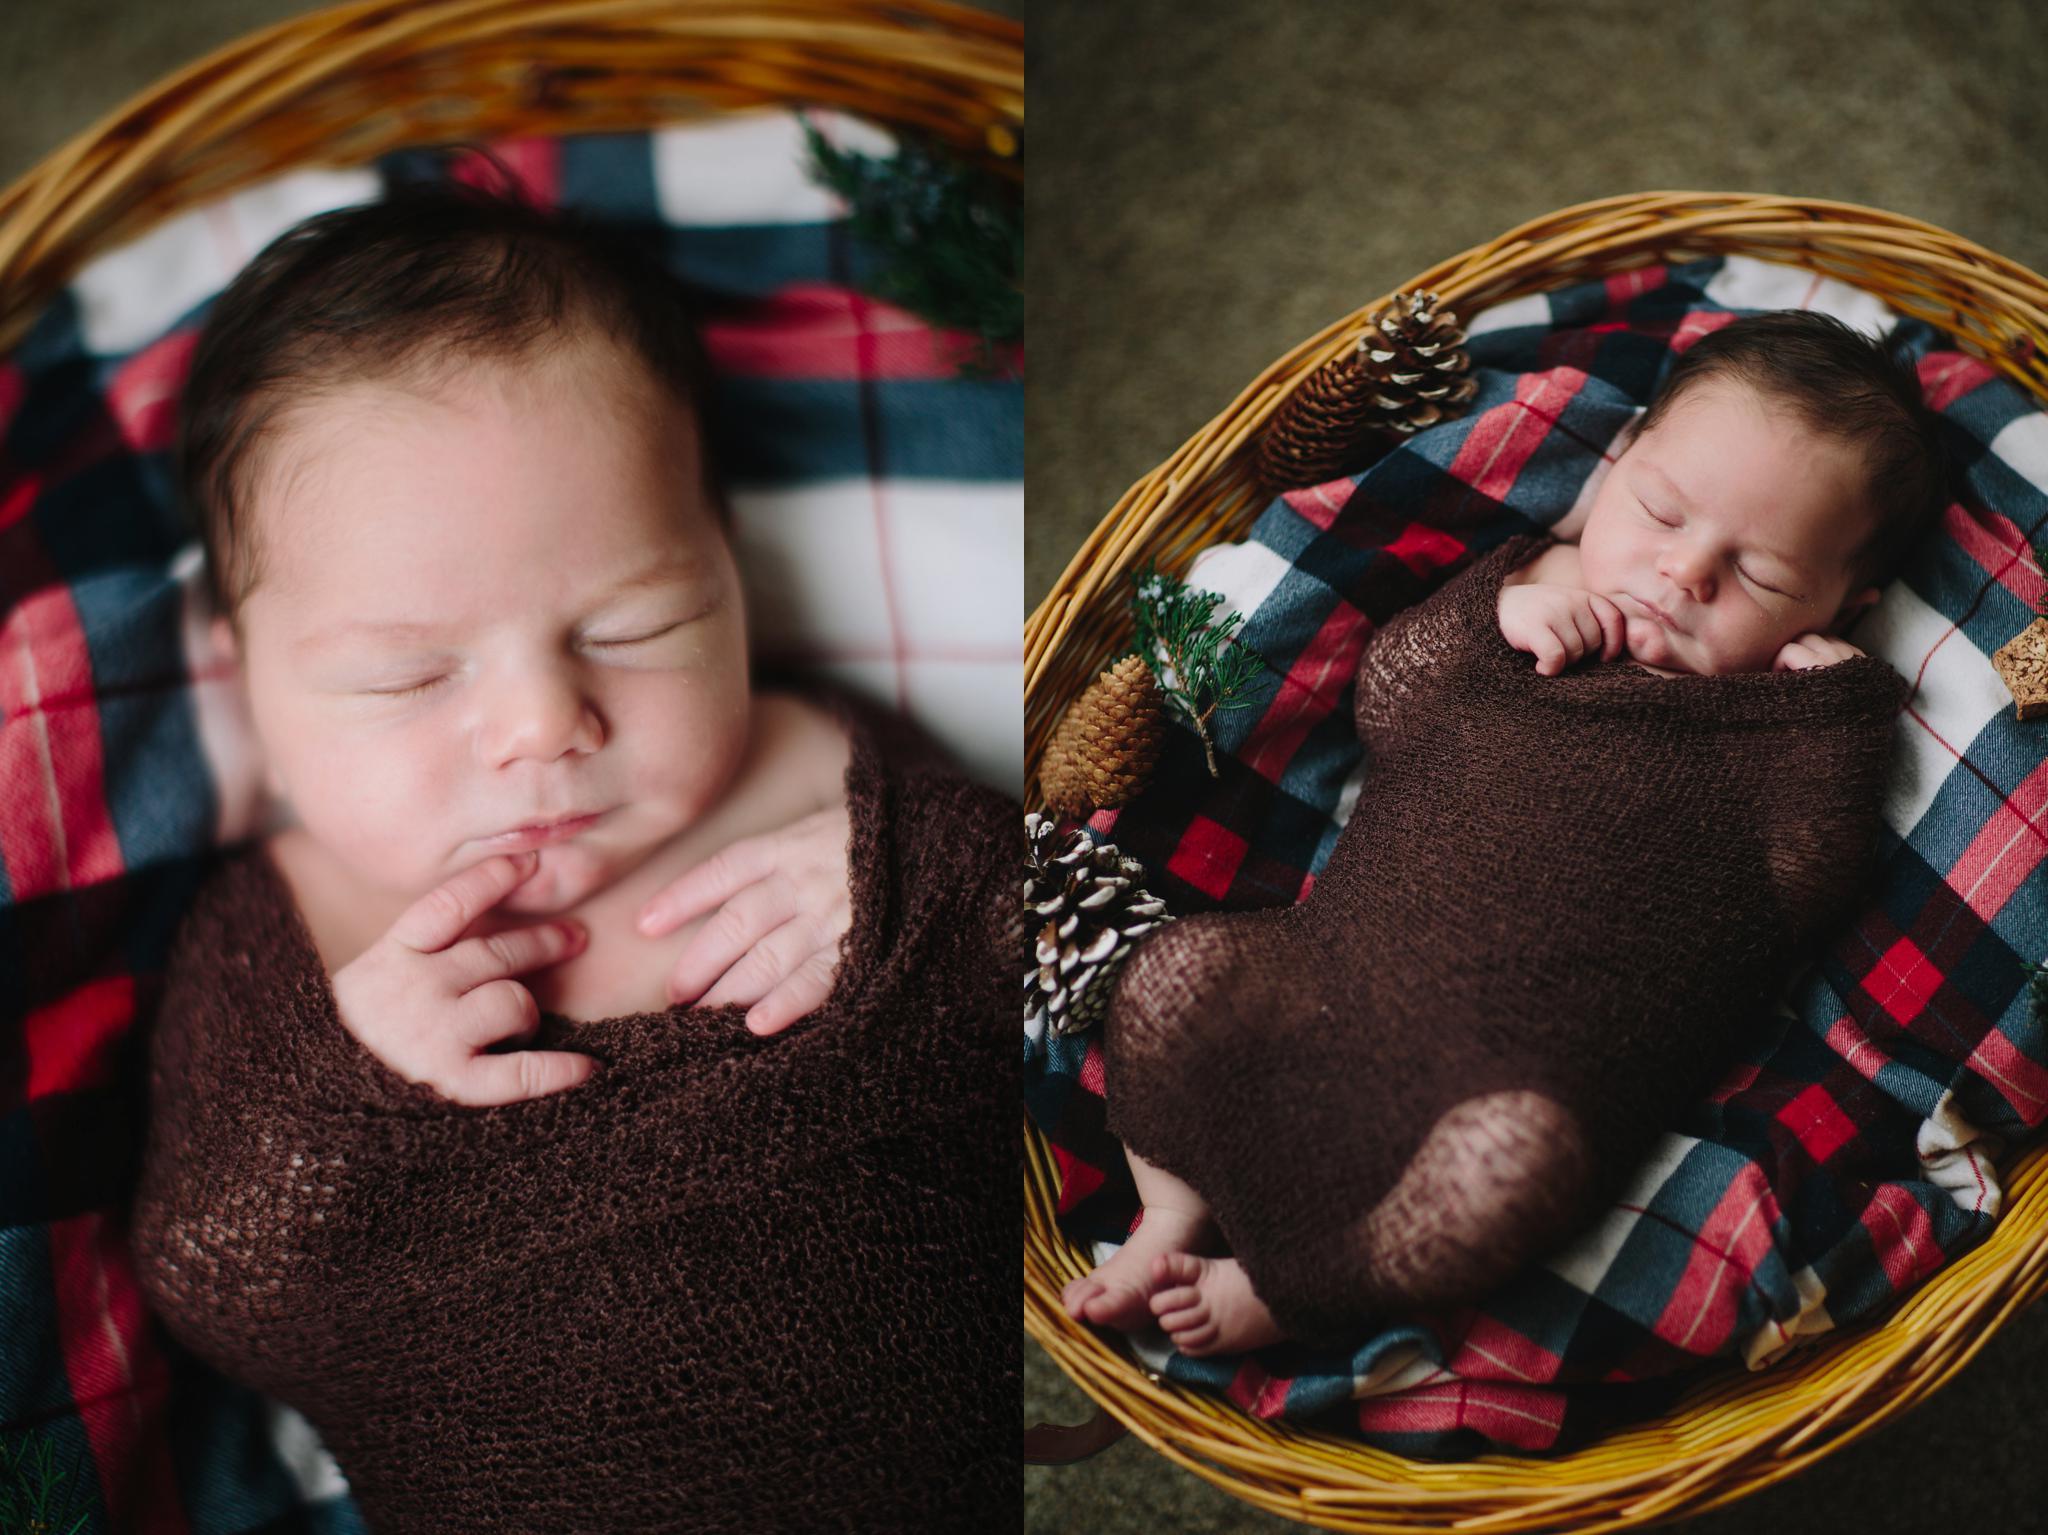 tunkhannock_newborn_photographer_4356.jpg